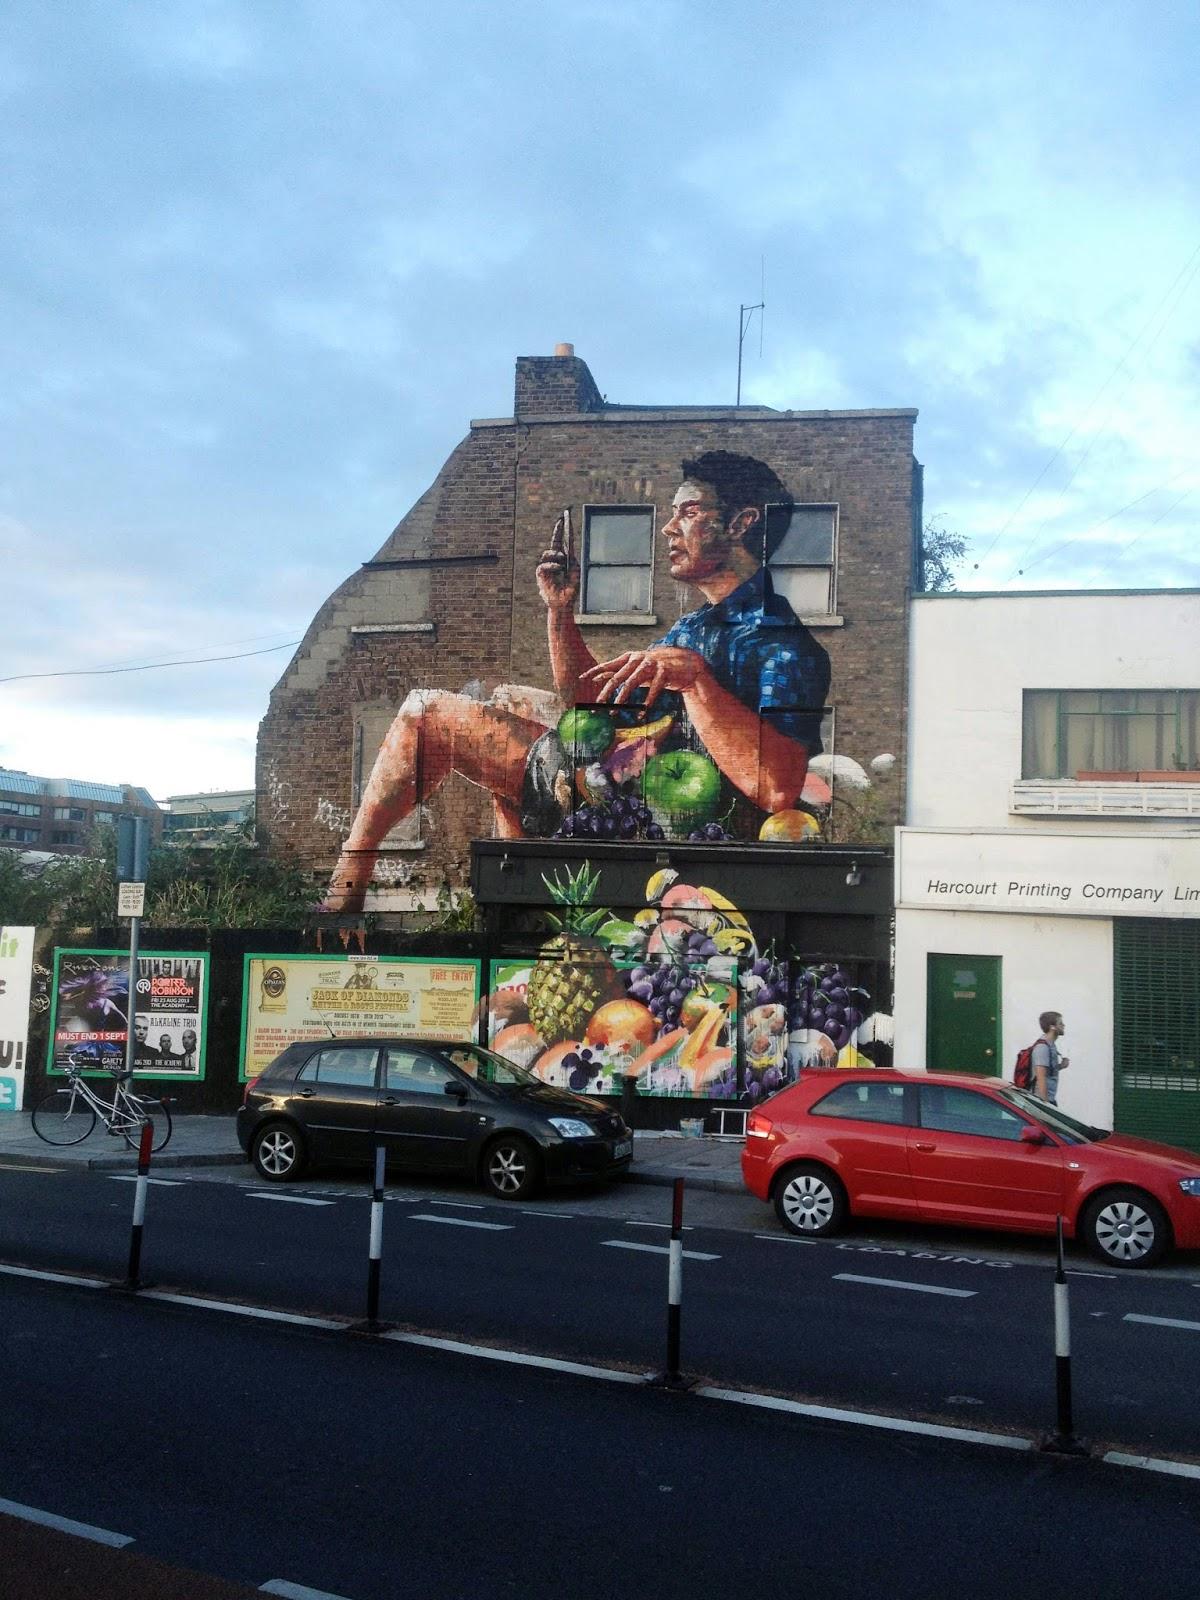 Fintan magee new mural in dublin ireland streetartnews for Mural ireland